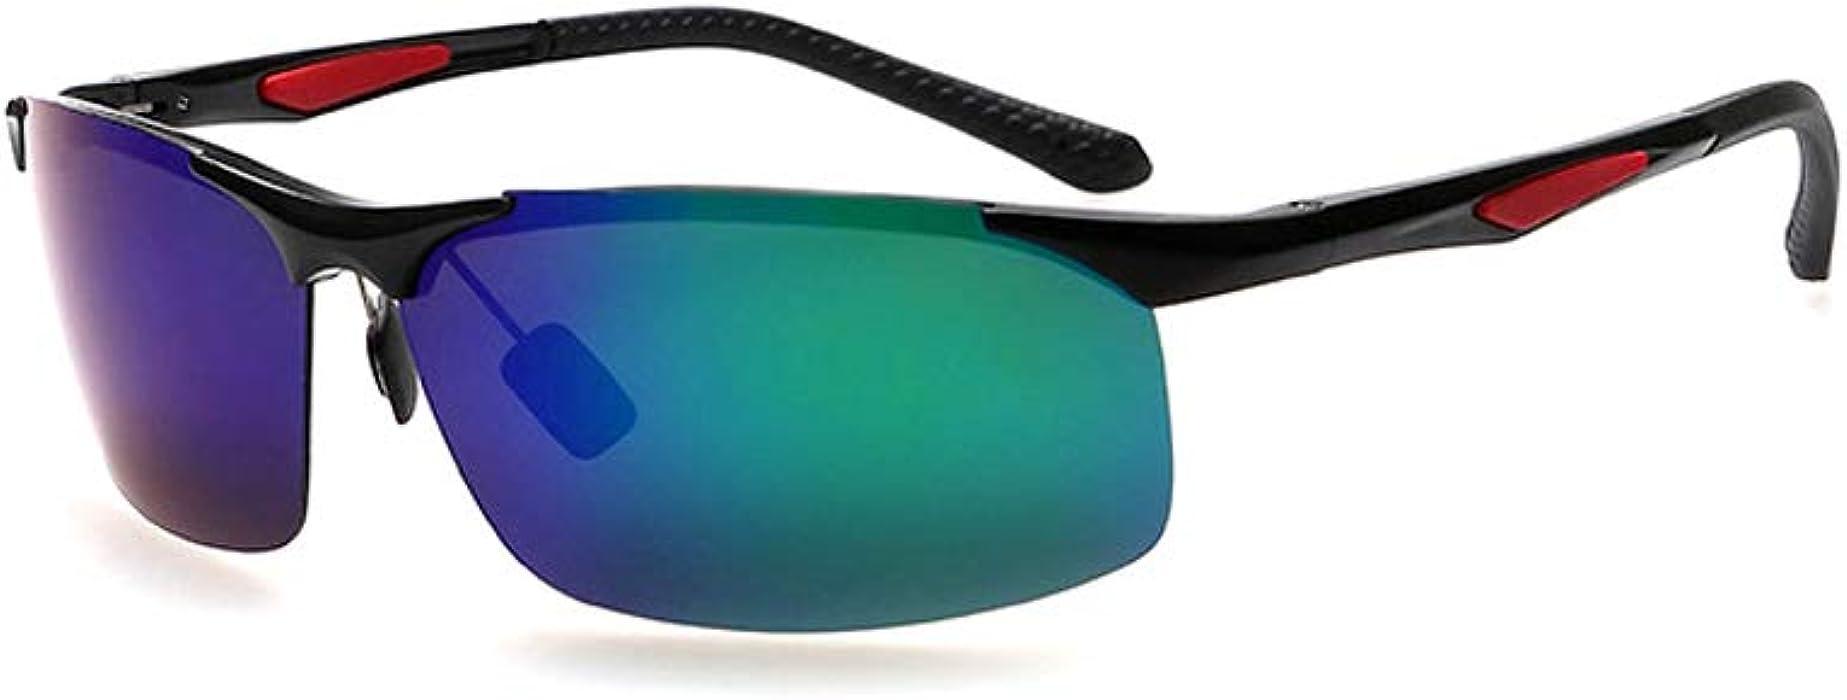 98d86607a9 Ronsou Men s Sport Aluminium-Magnesium Polarized Sunglasses For Driving  Cycling Fishing Golf Glasses black frame